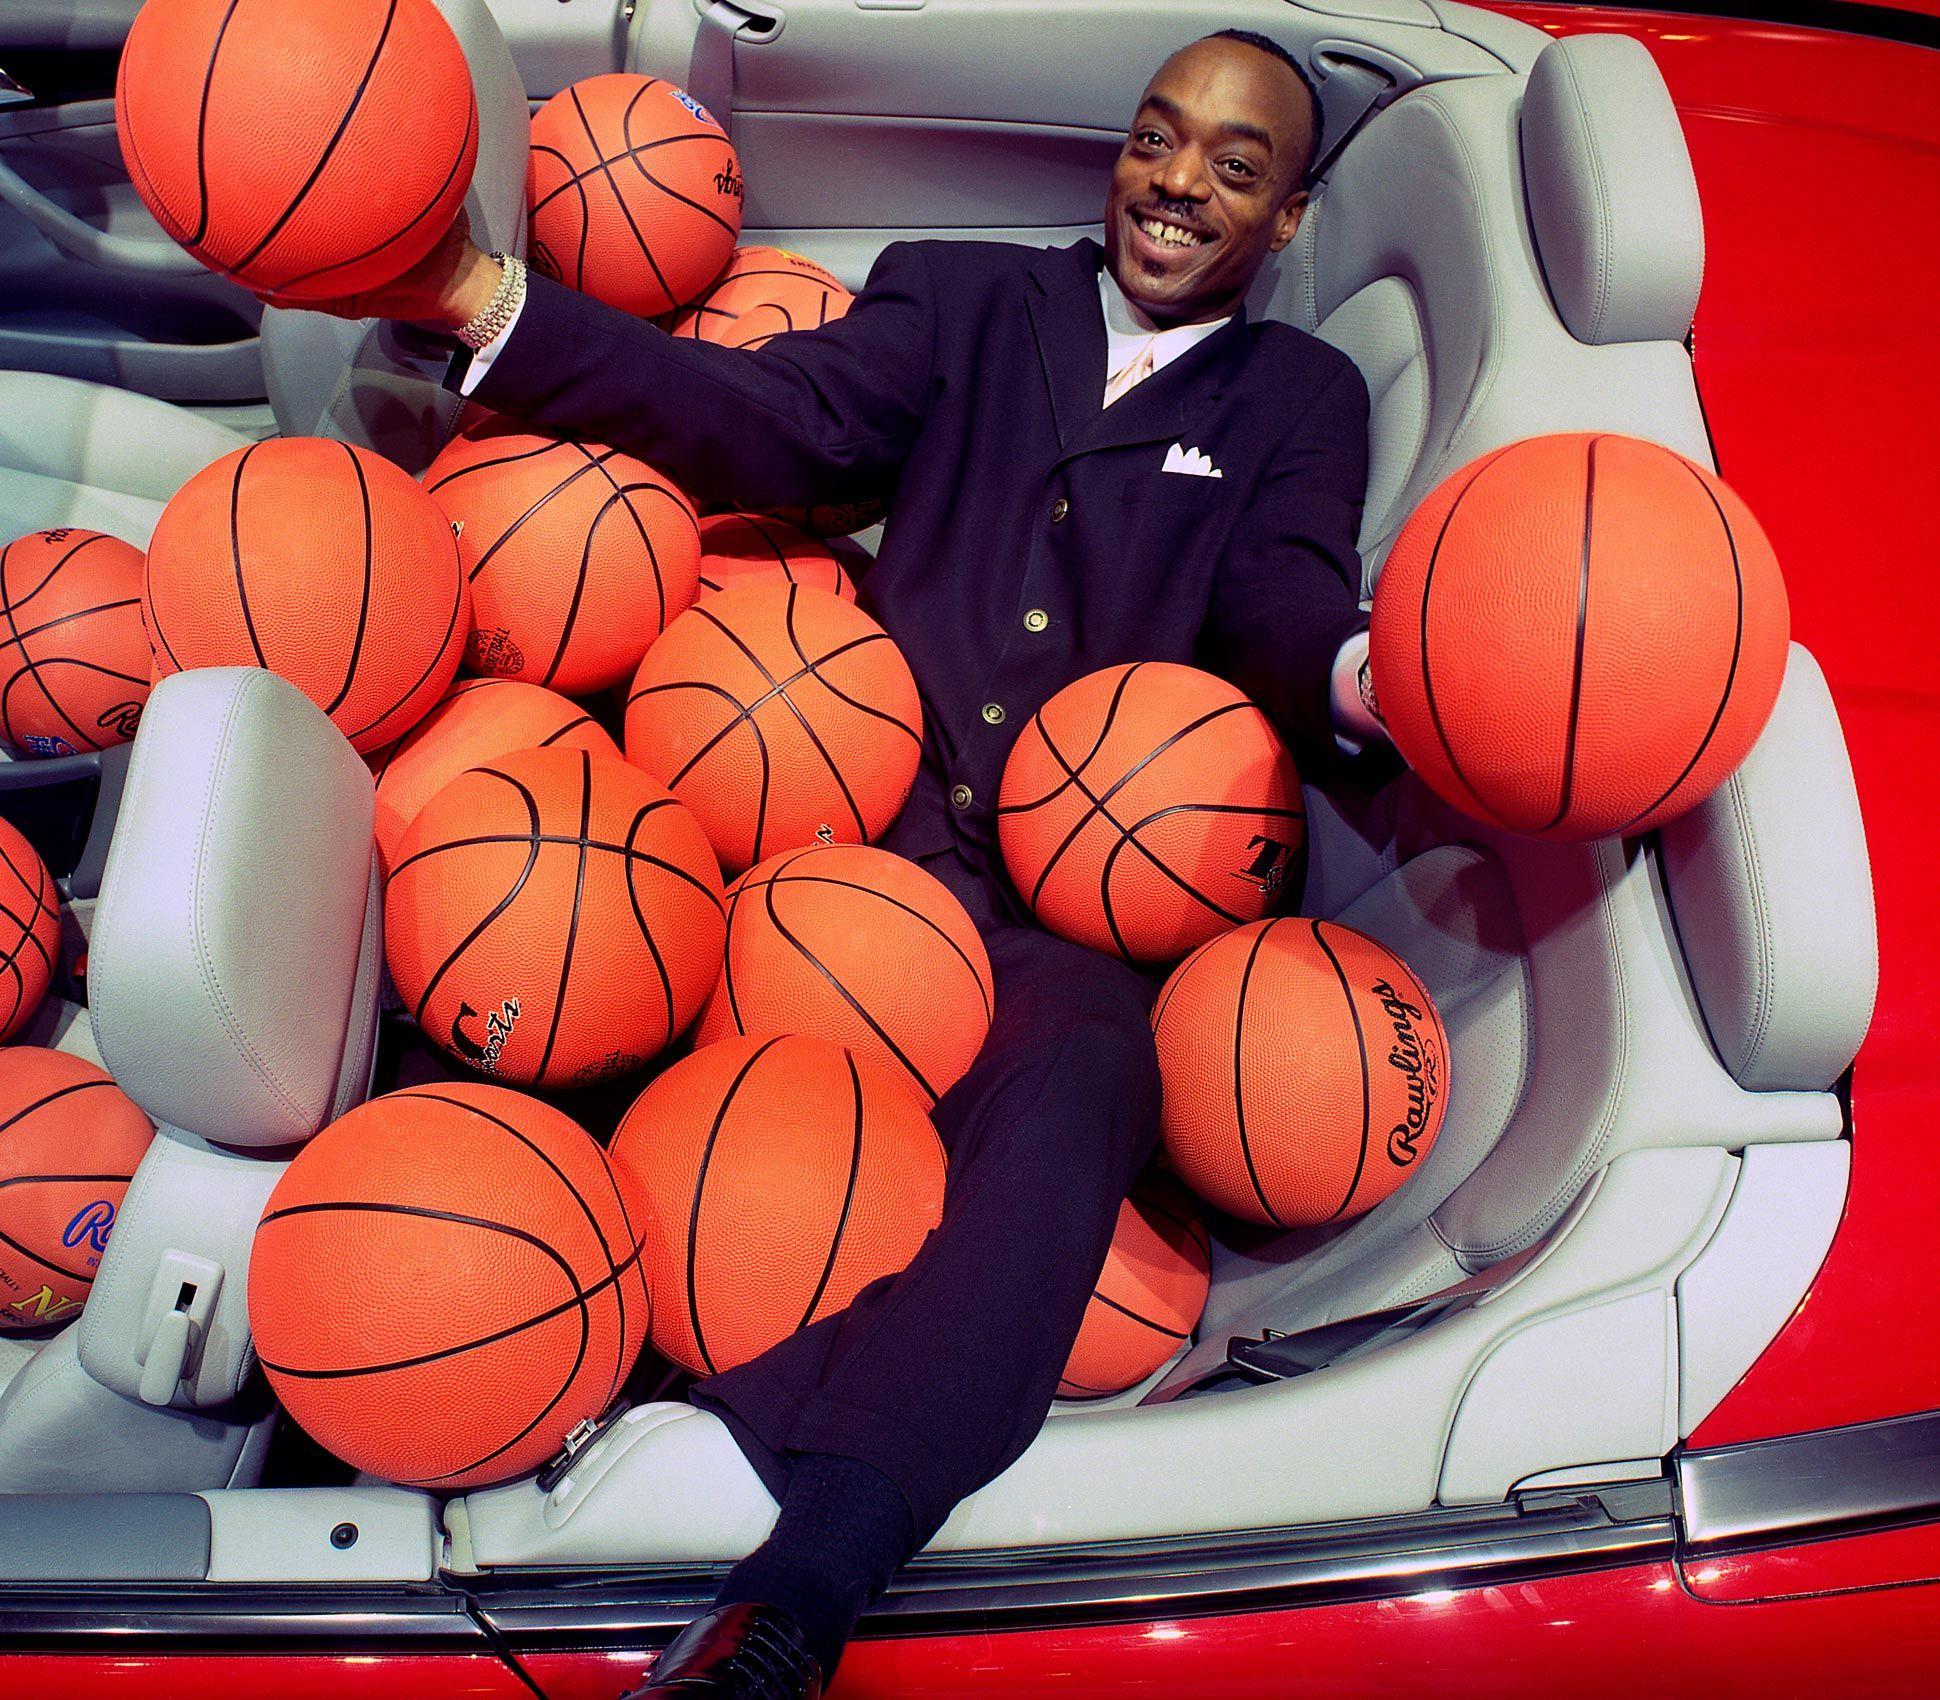 Basketball_car.jpg